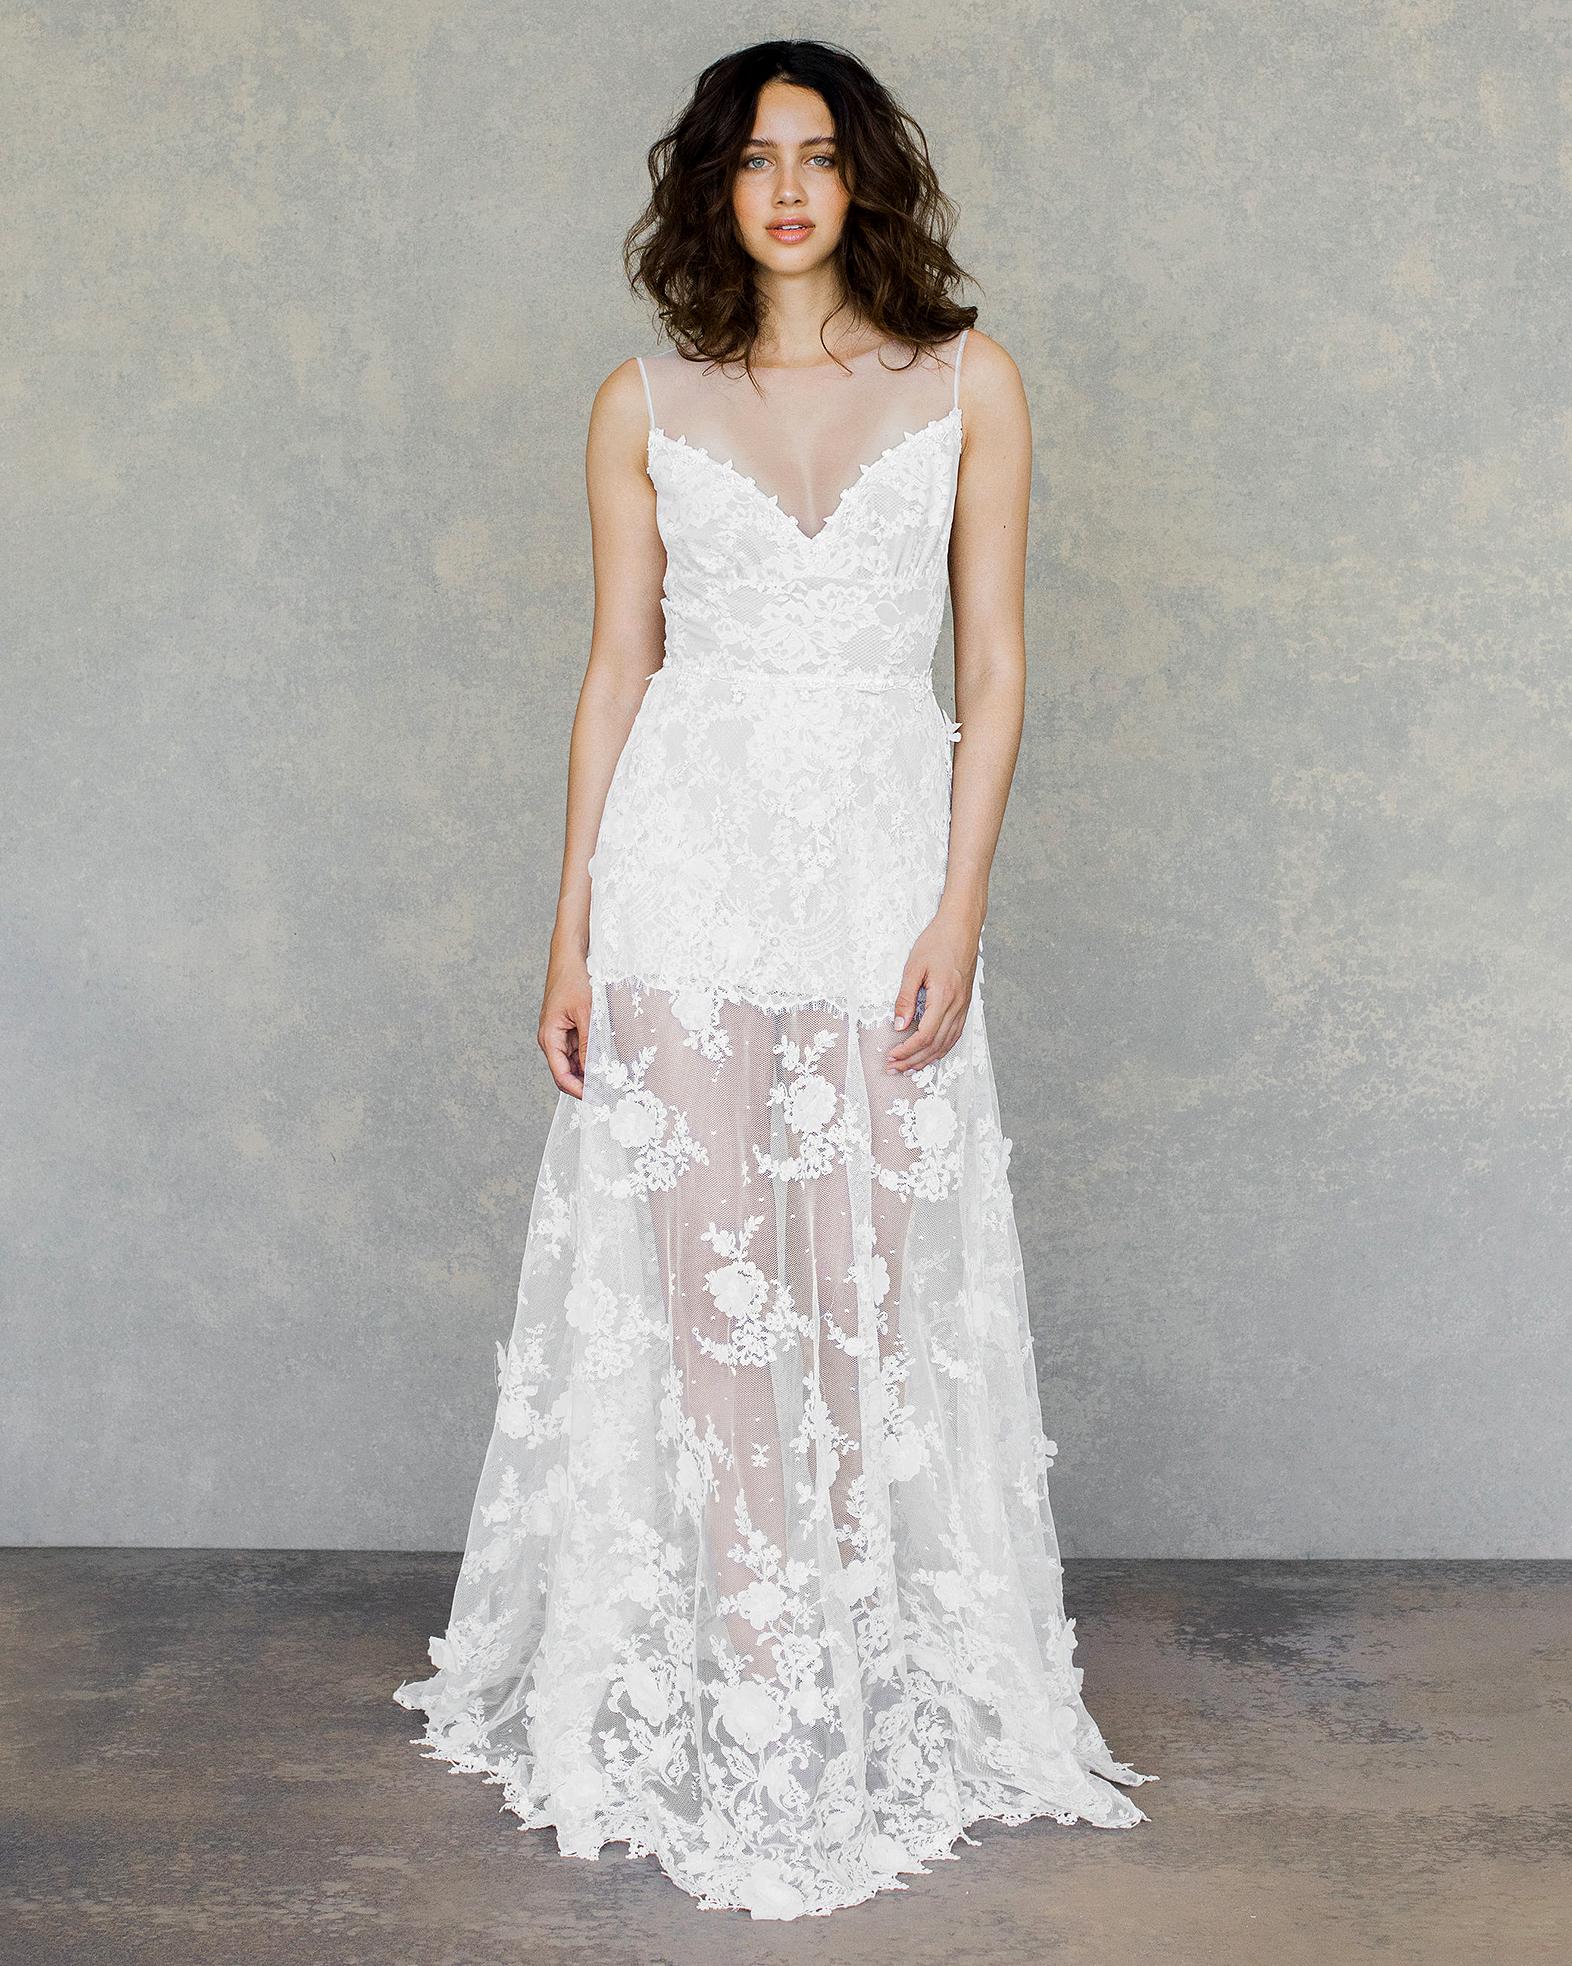 claire pettibone wedding dress spring 2019 illusion neck short sheer overlay